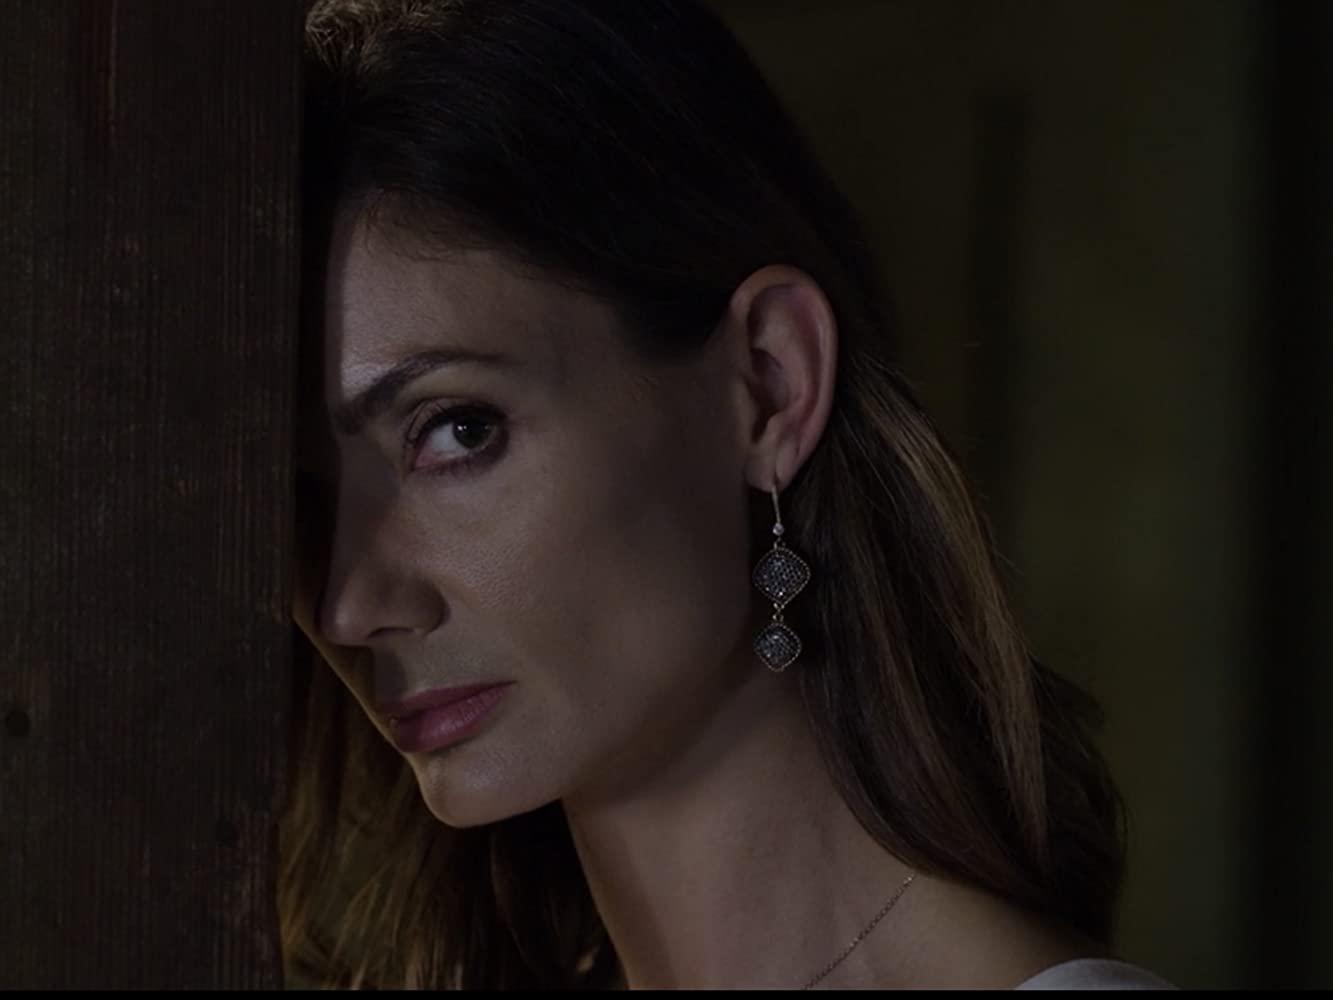 مشاهدة فيلم Agent Jade Black (2019) مترجم HD اون لاين